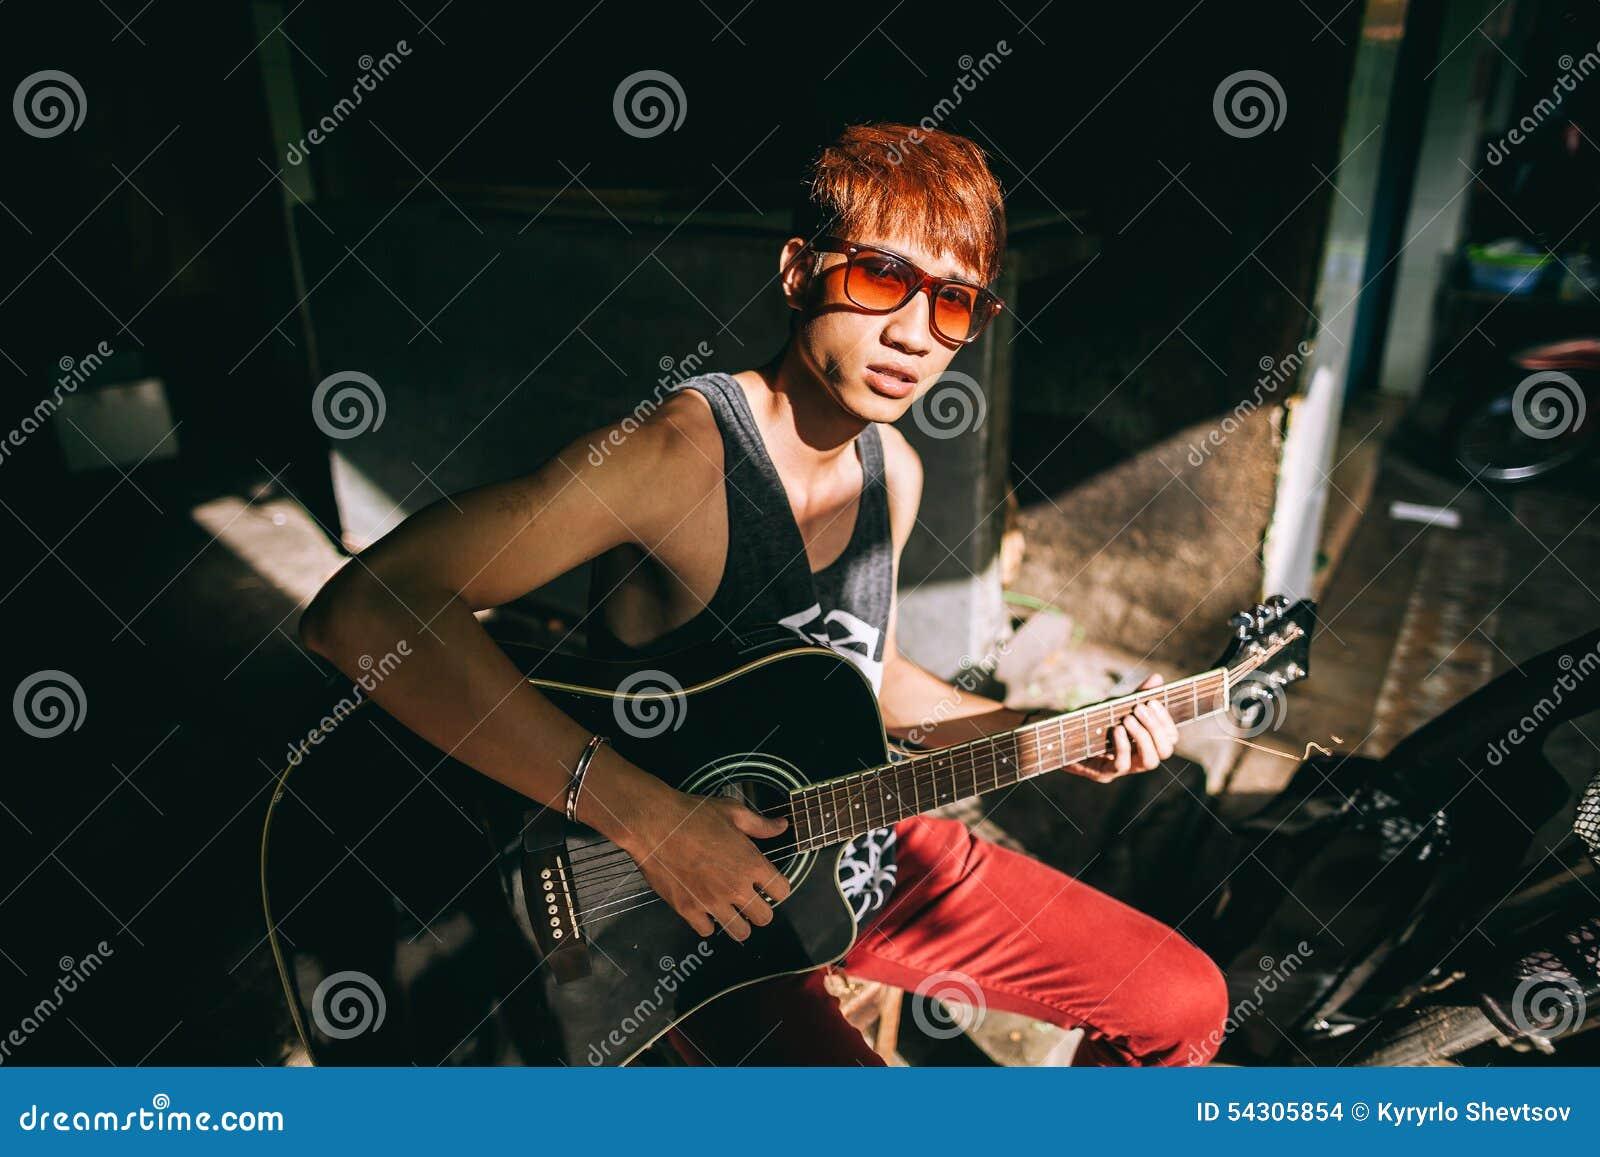 a43c610d38 Asian Guitarist Artist Man Play Guitar On Street Stock Photo - Image ...